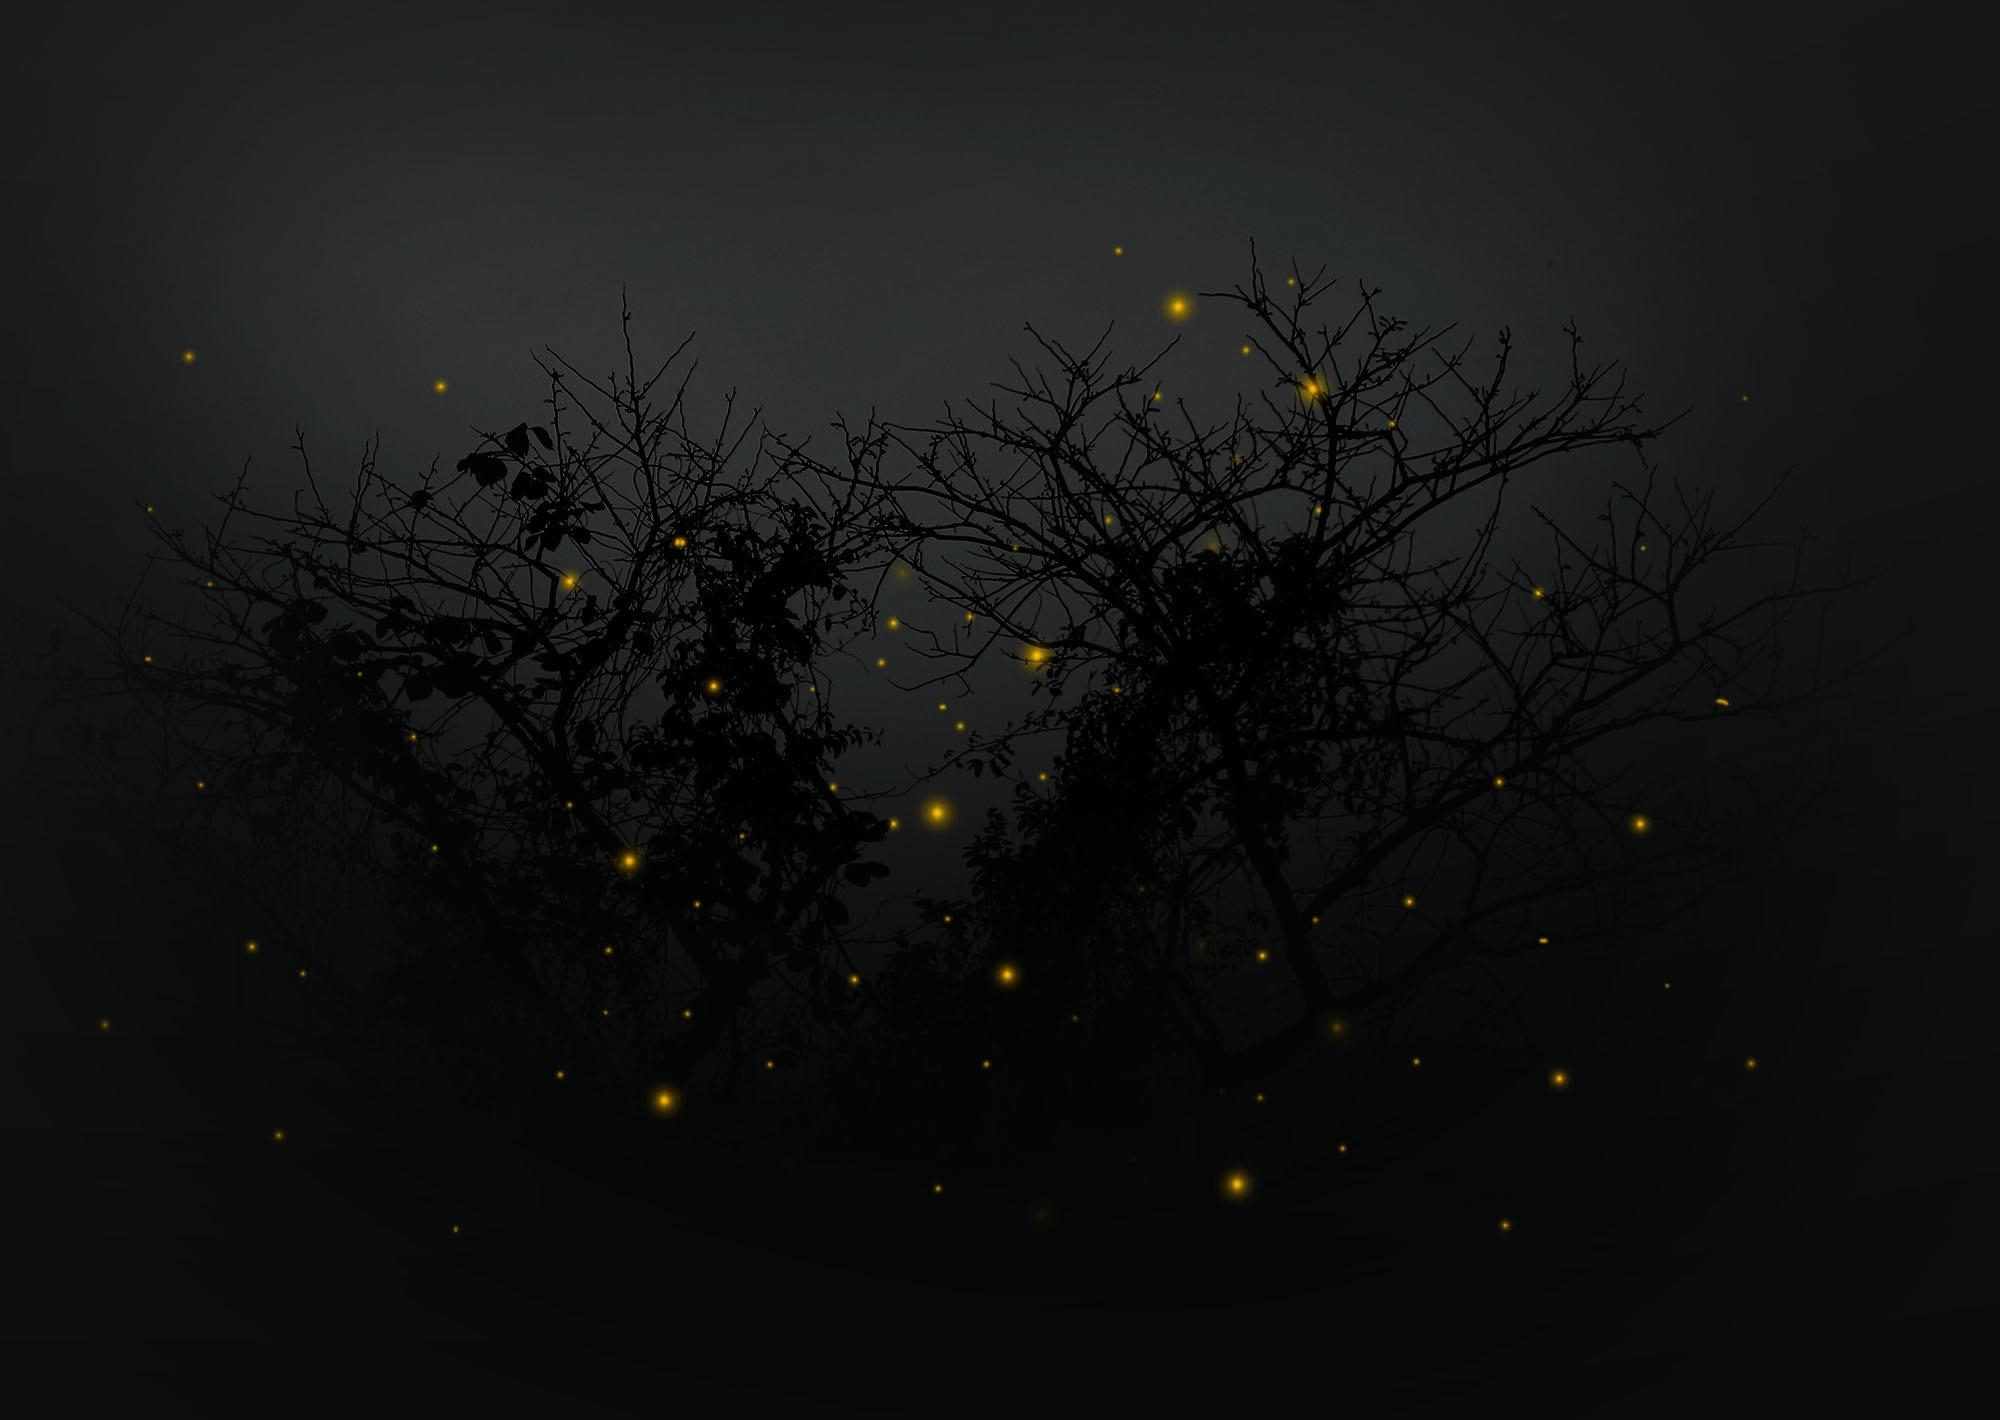 Fireflies by Bernard Miranda